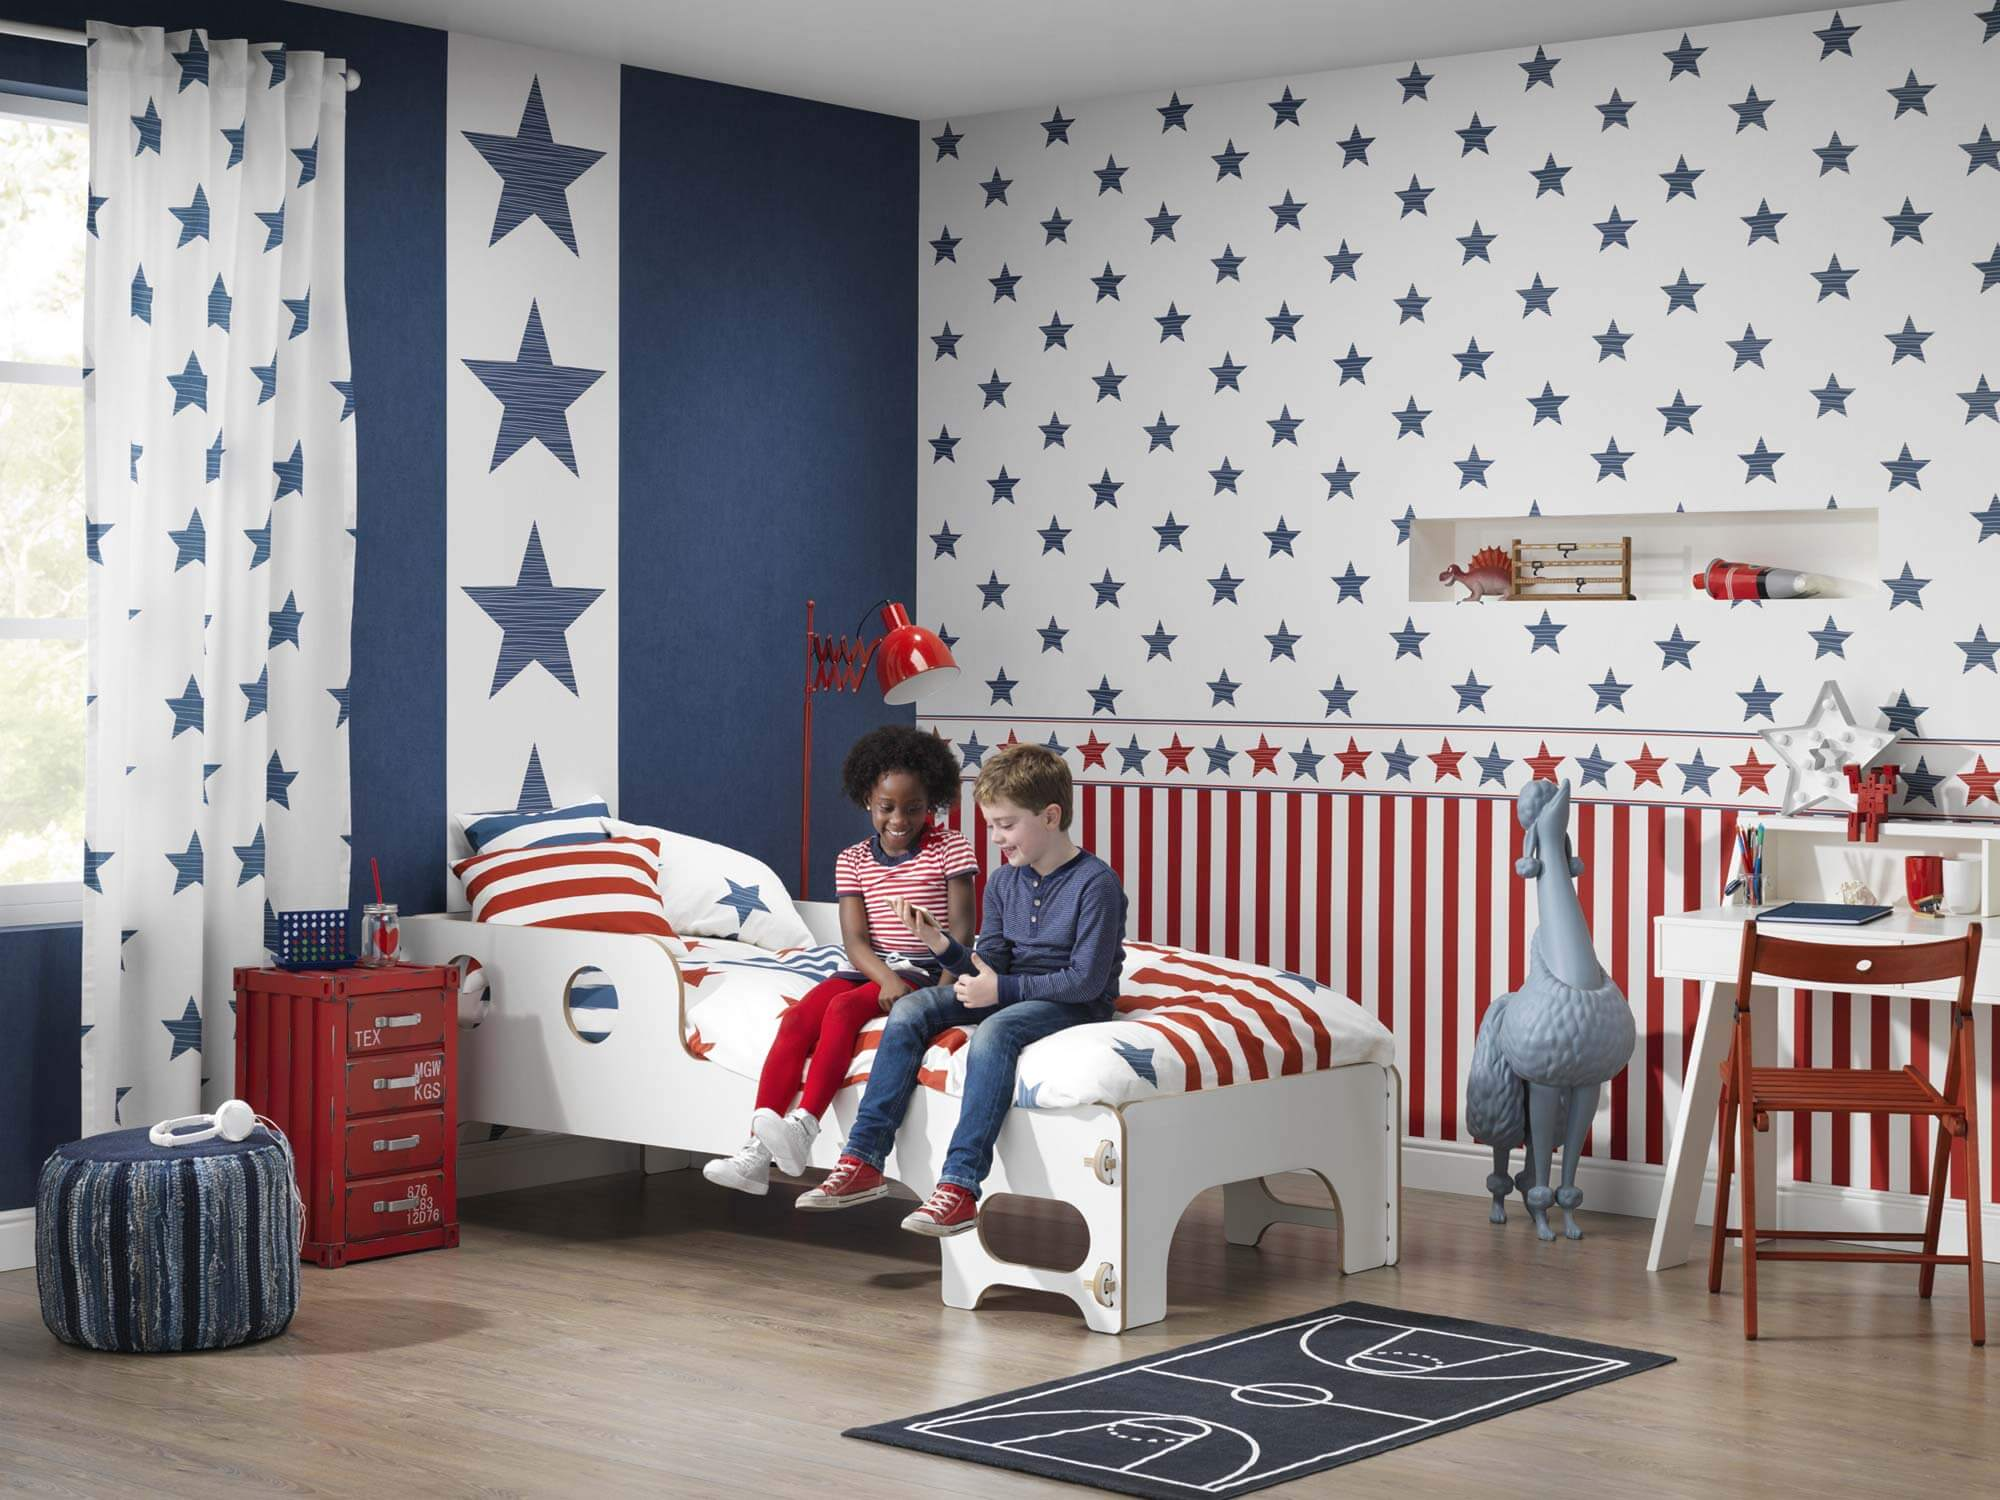 40 Einzigartig Rasch Tapeten Kinderzimmer | Ayu dia Bing Slamet